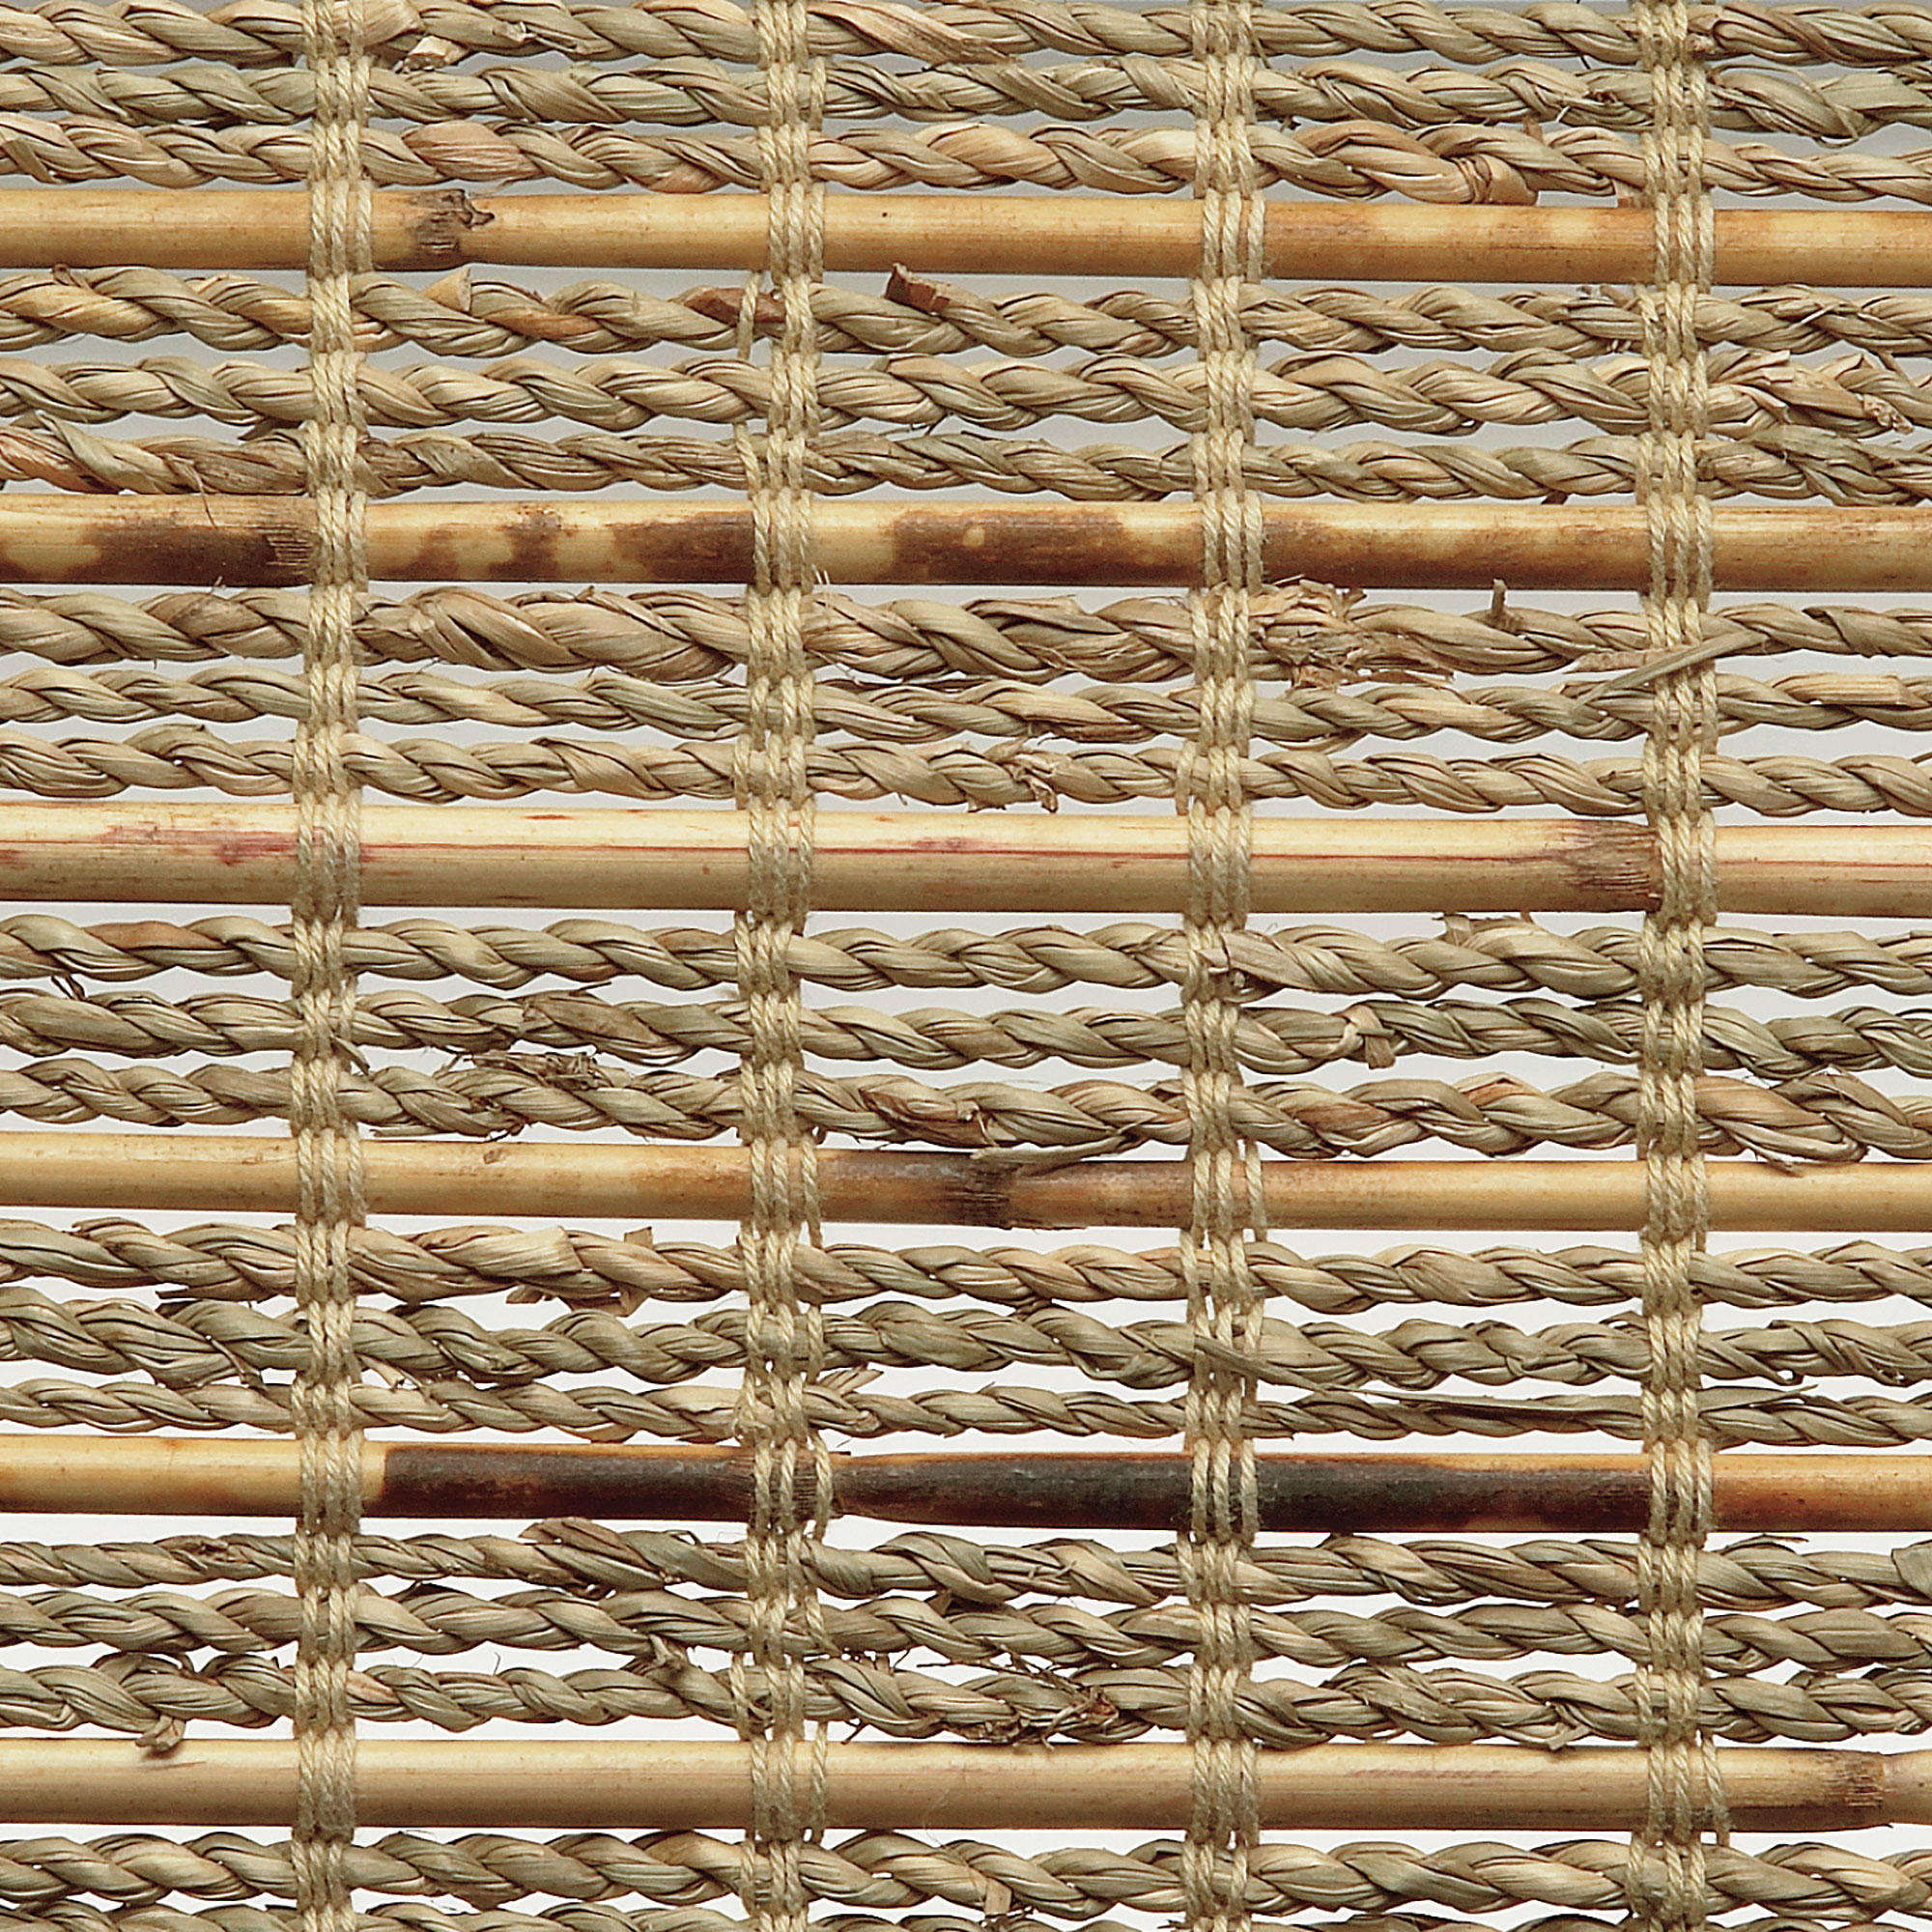 swatch-No.14-jomon-reed-web.jpg